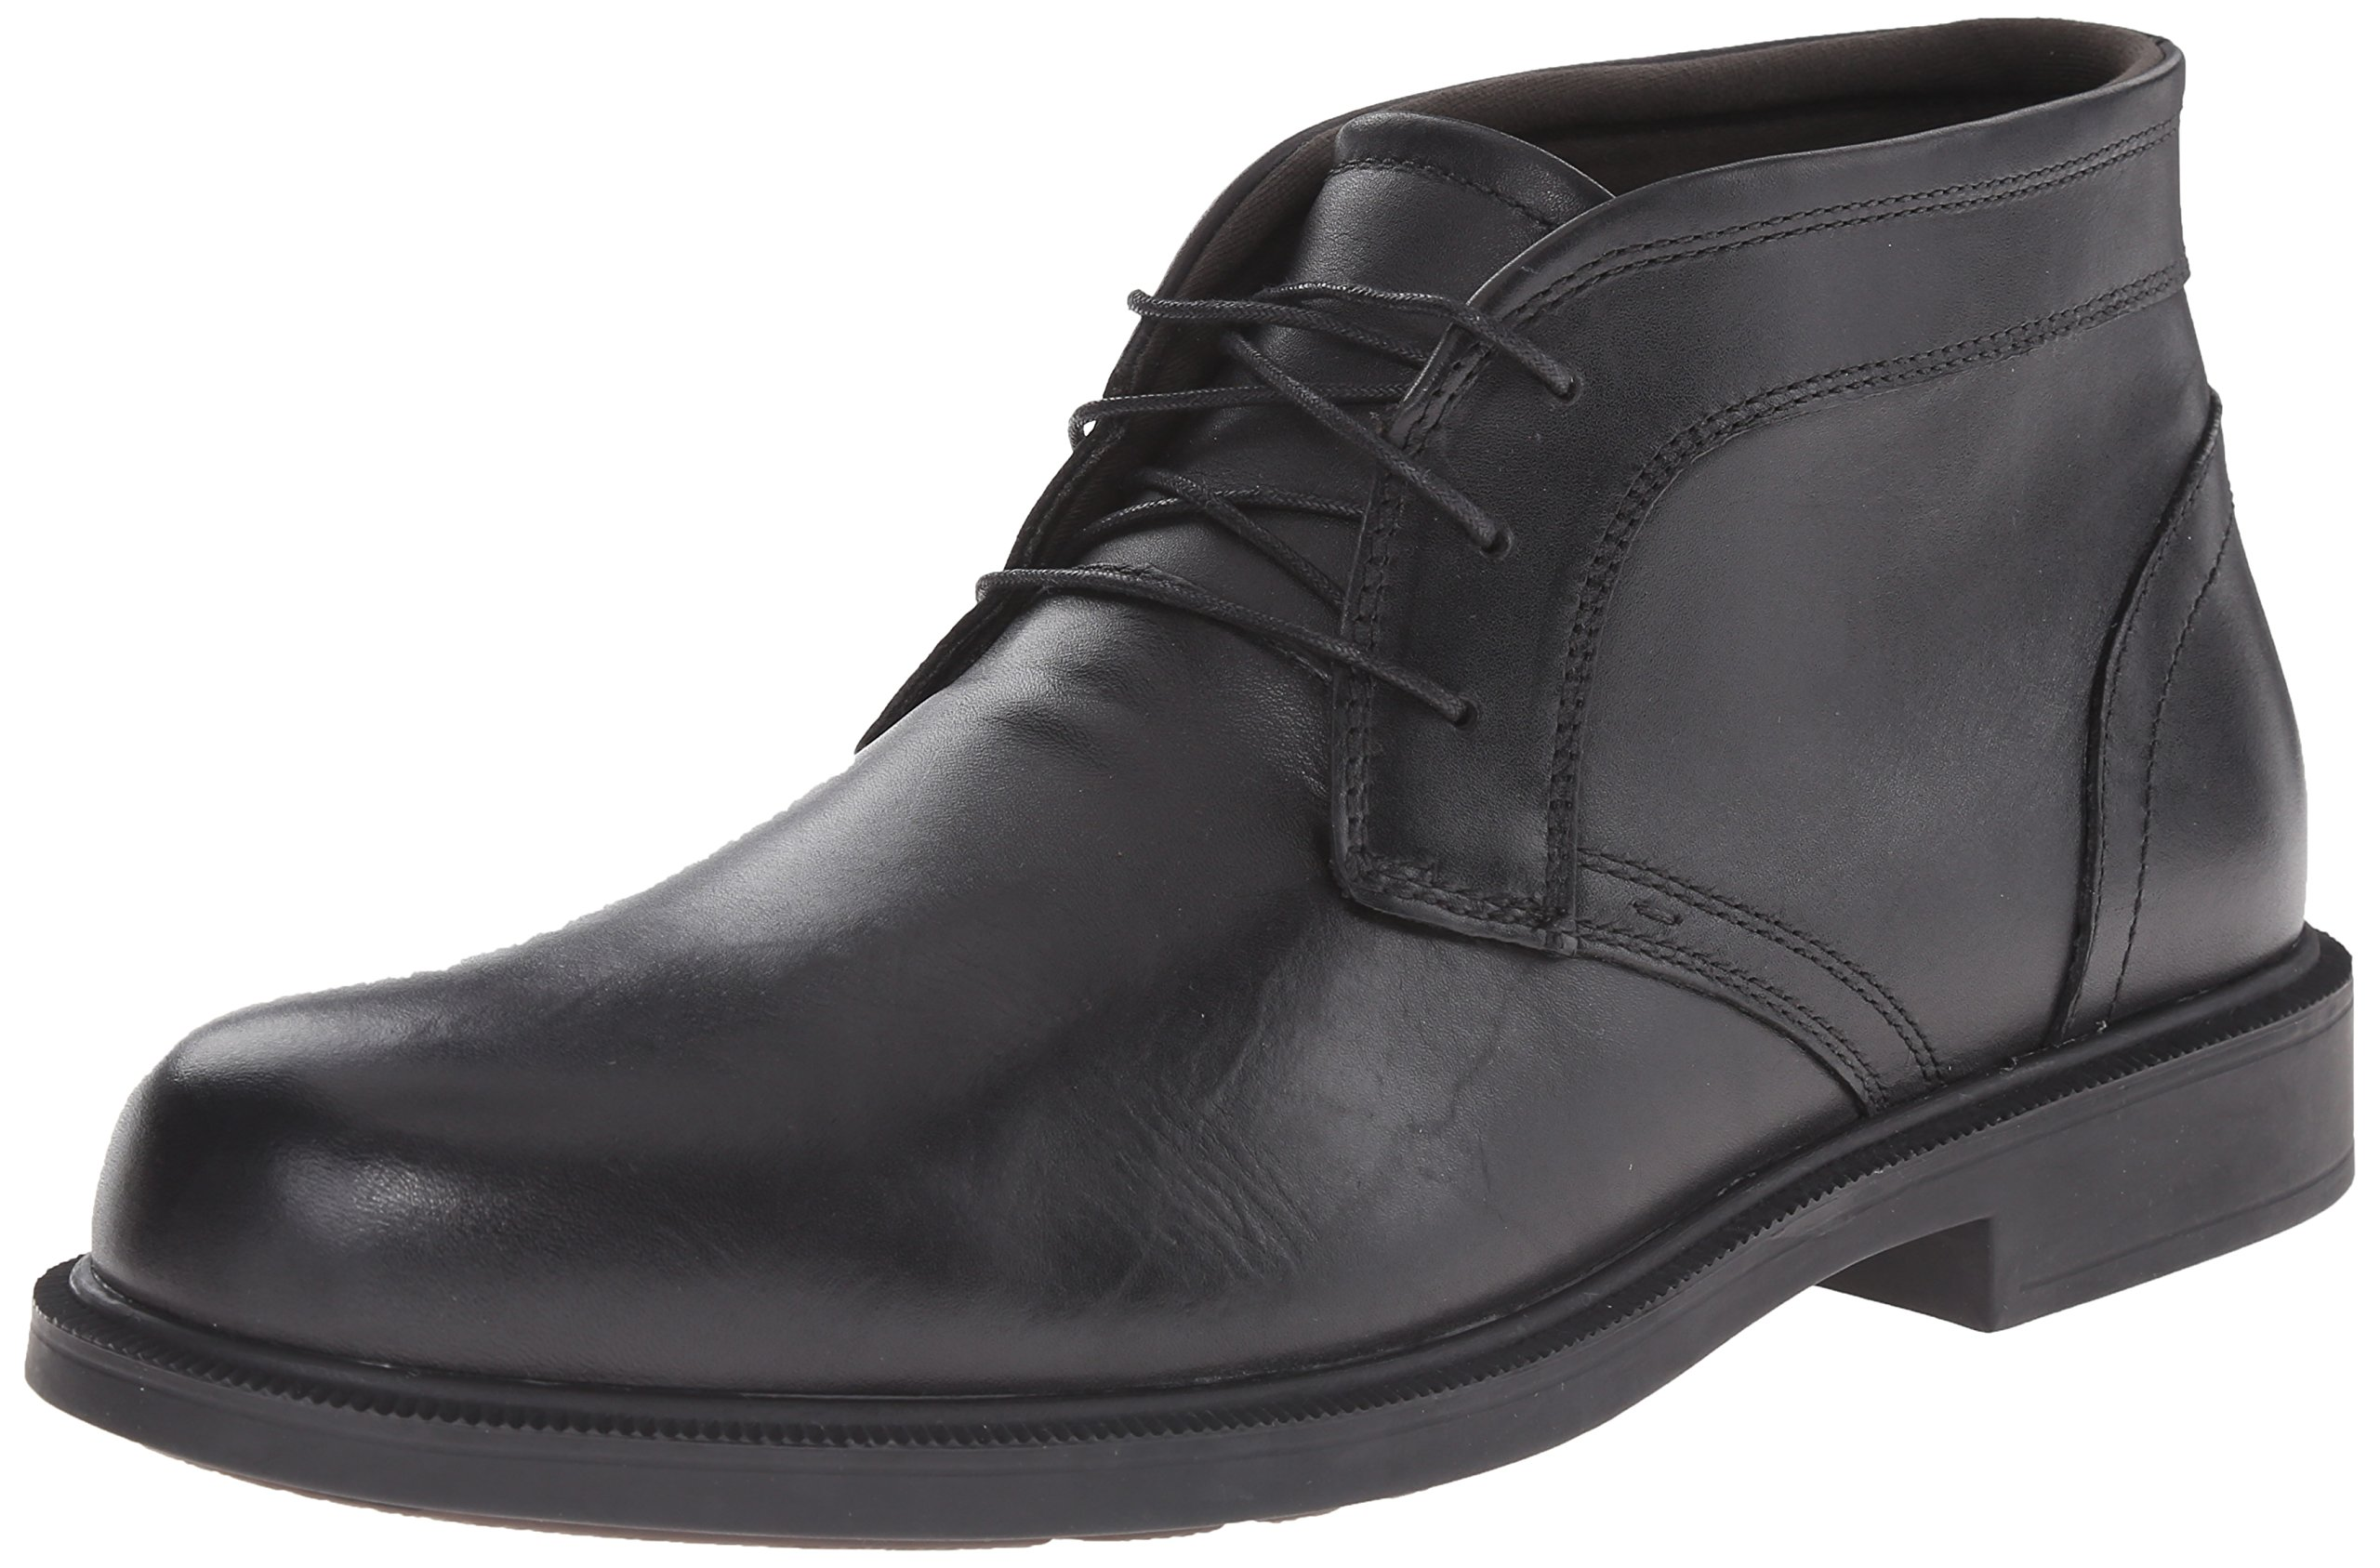 Dunham Men's Johnson Waterproof Boot,Black,12 4E US